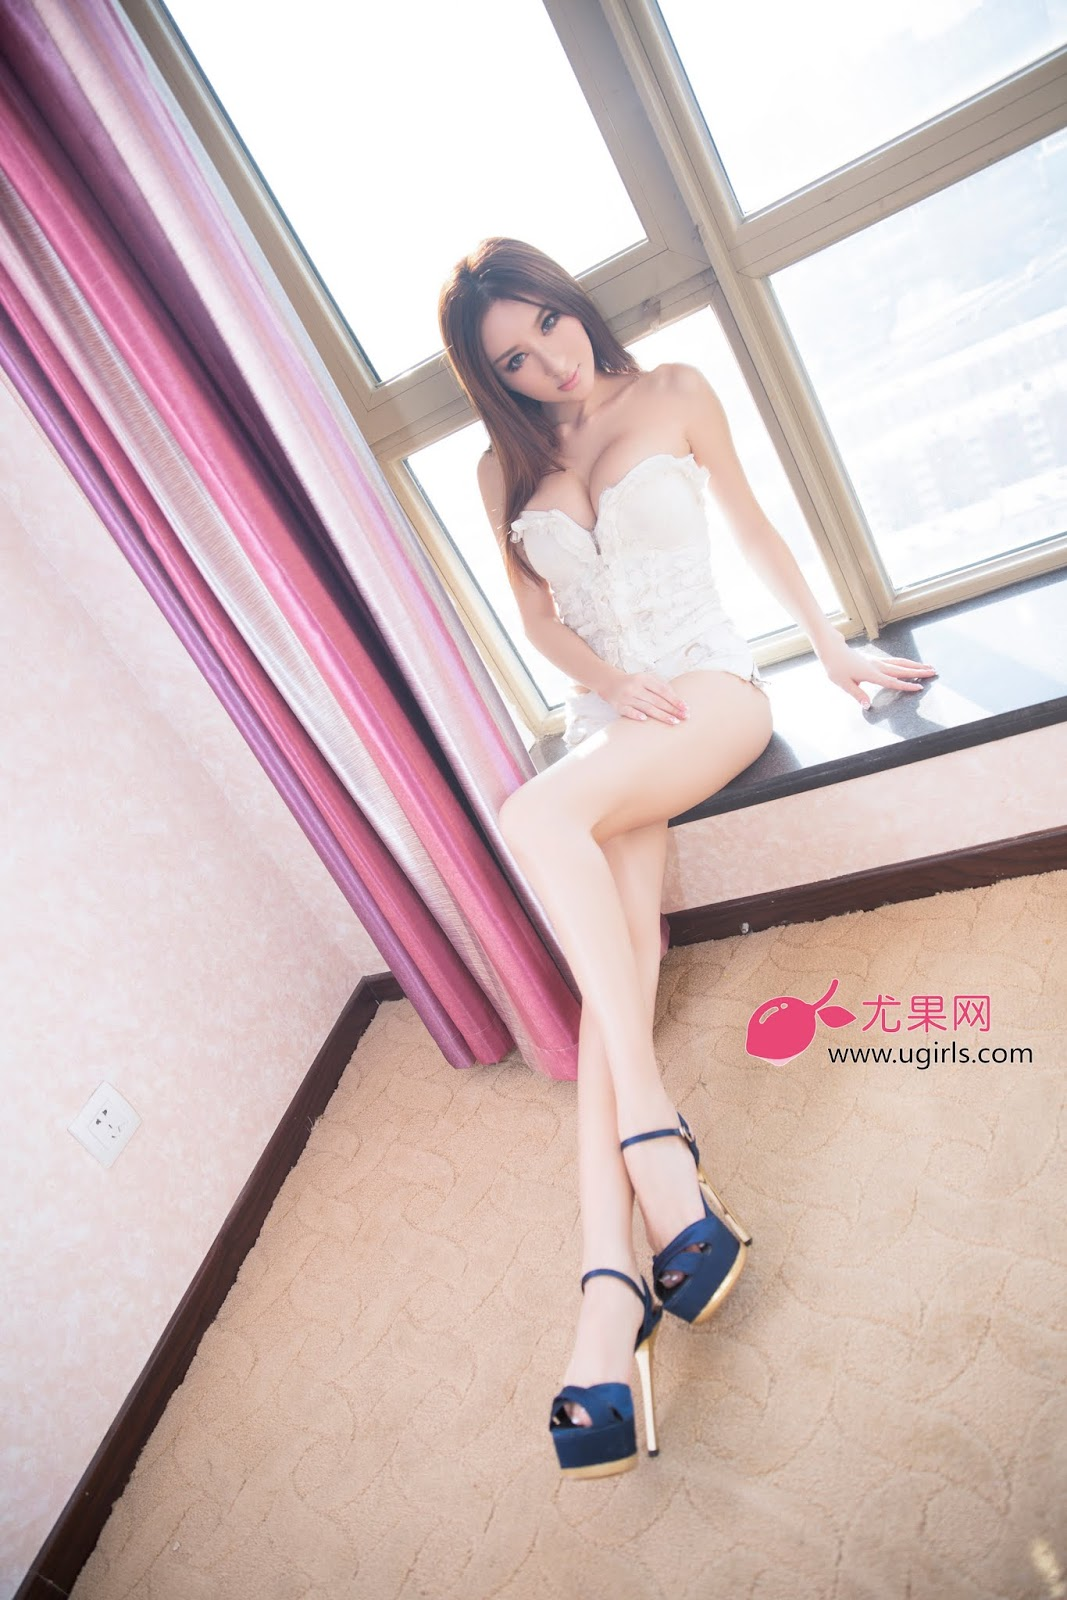 A14A6537 - Hot Photo UGIRLS NO.6 Nude Girl